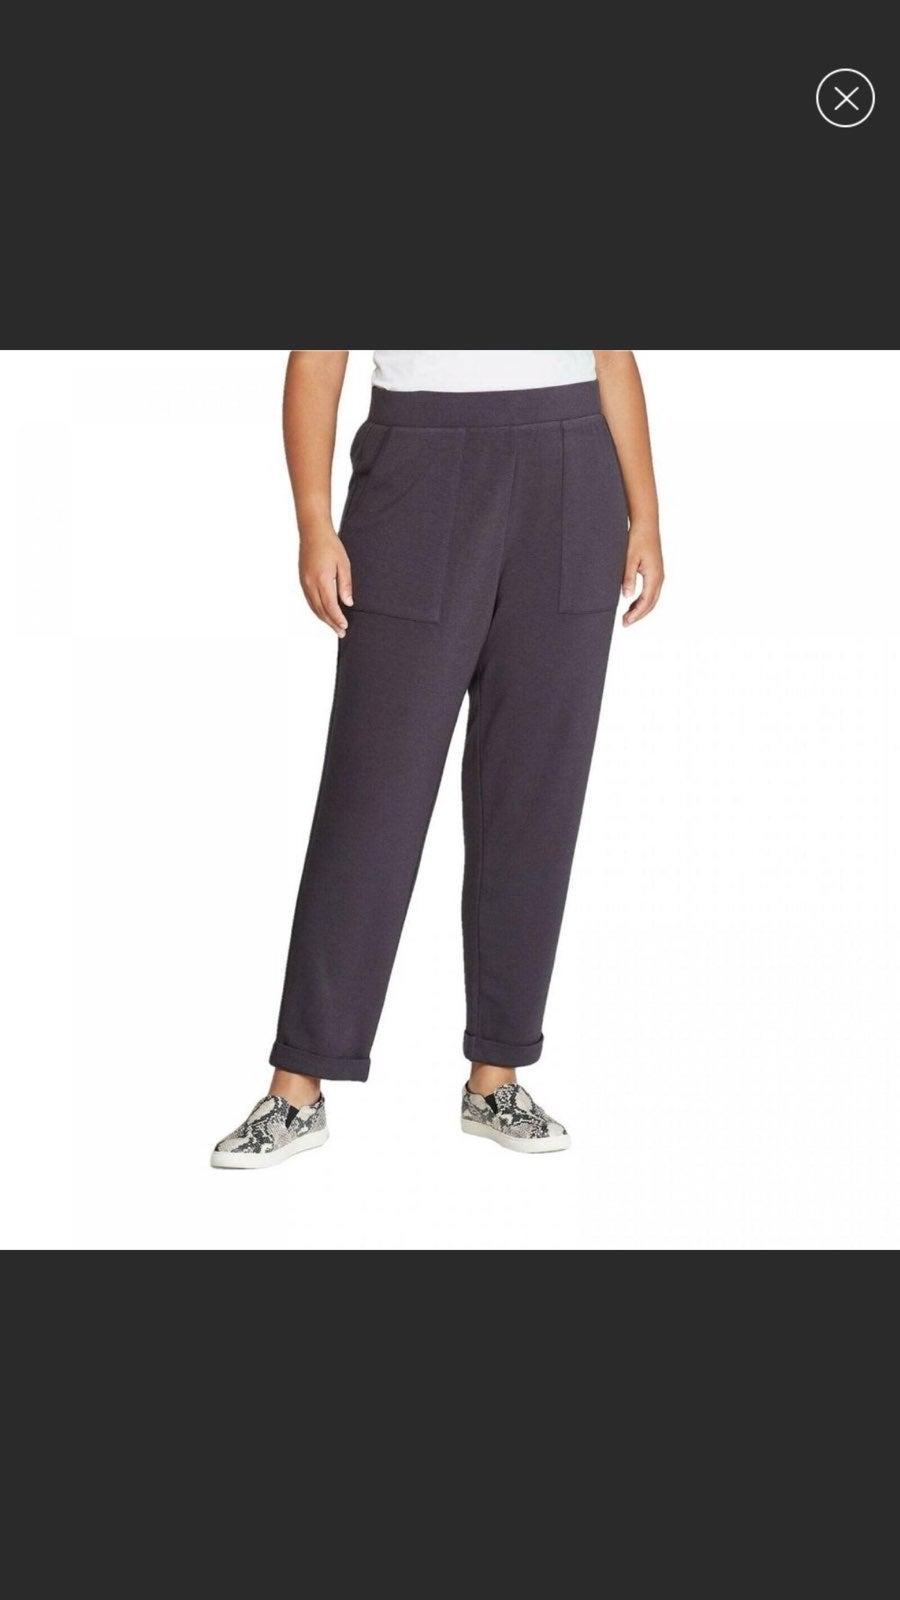 Ava & Viv Gray lounge pants with pockets